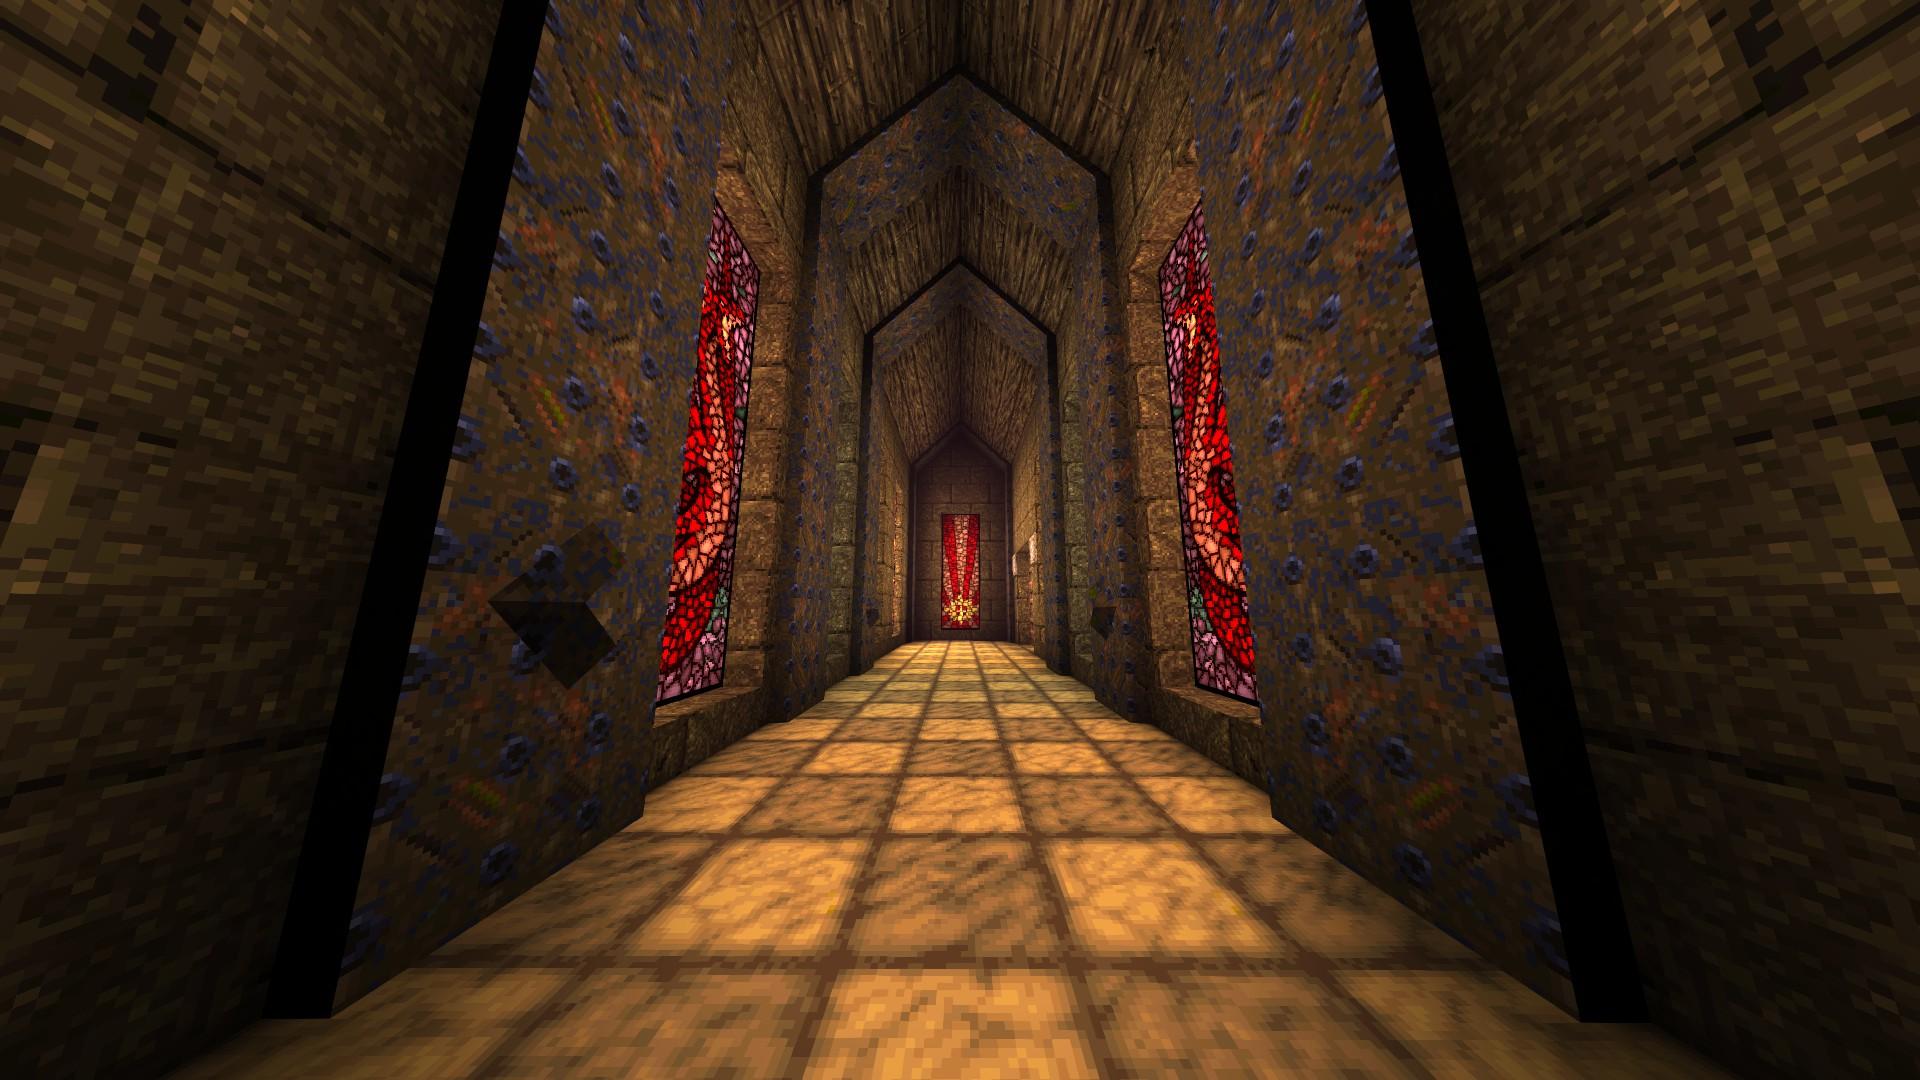 Quake - Locations of All Secrets in Game Tips - E2: Dominion of Darkness - Part I - 96C3E87